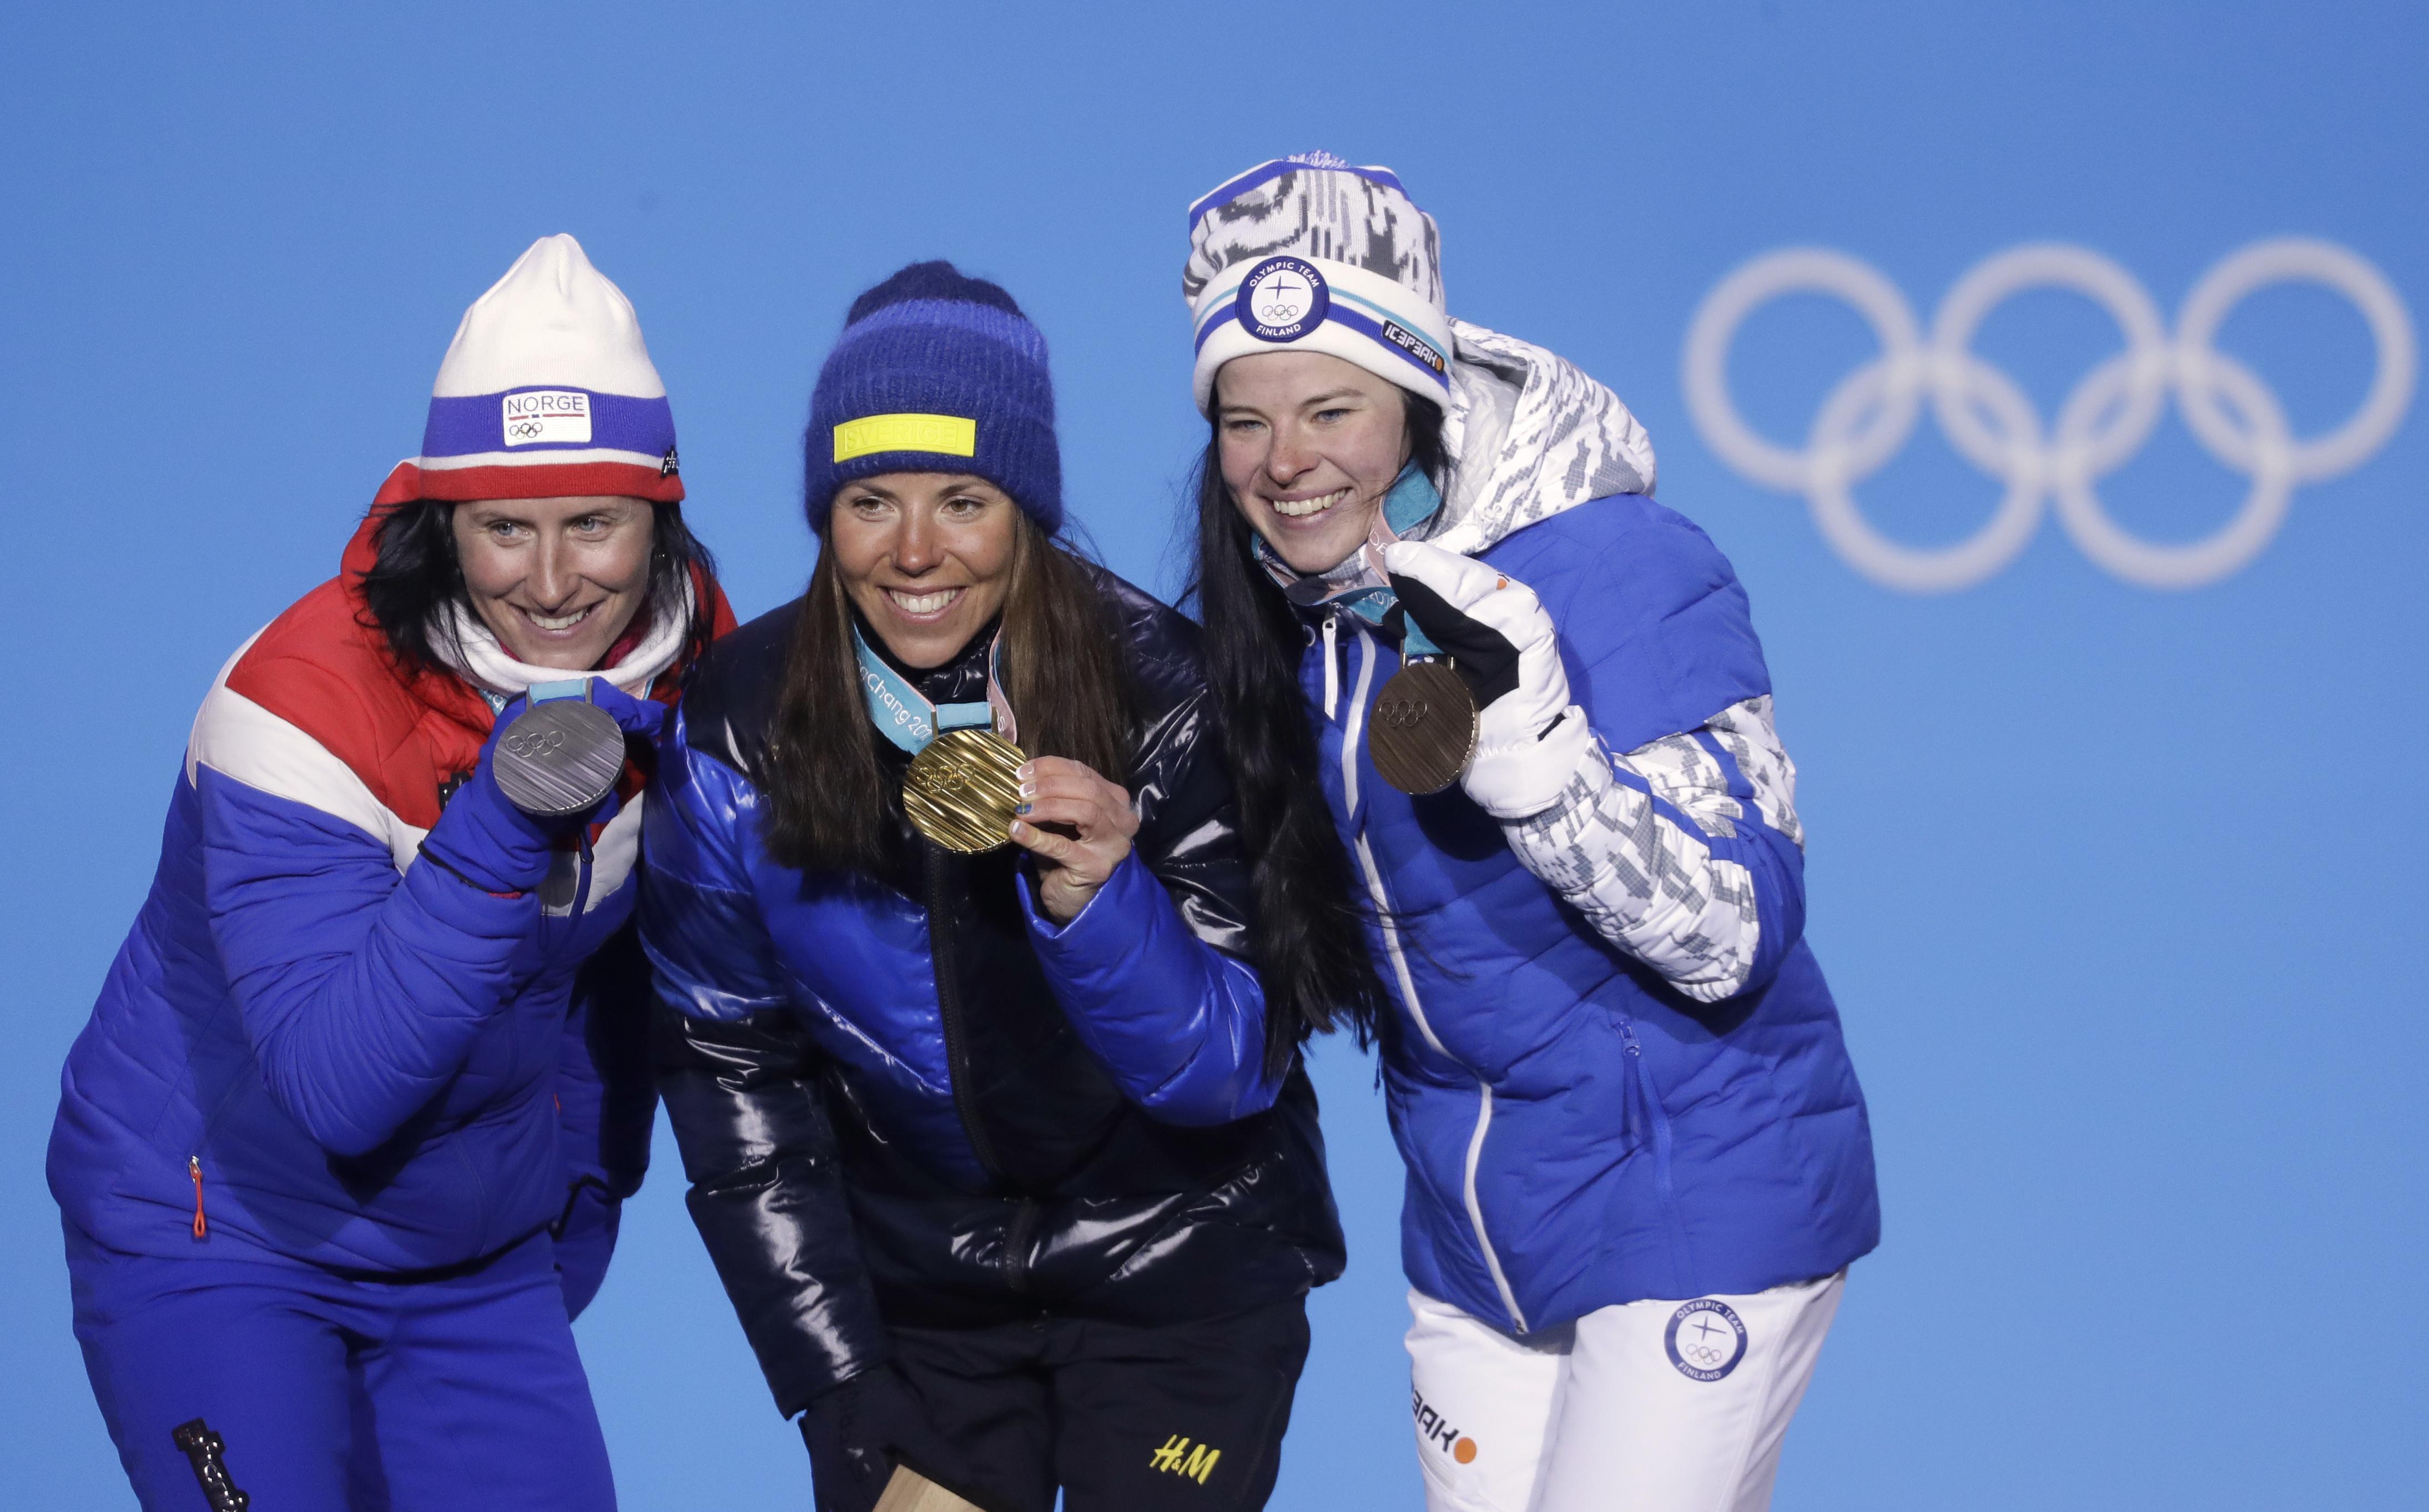 Raisa Smetanina 10 Olympic medals